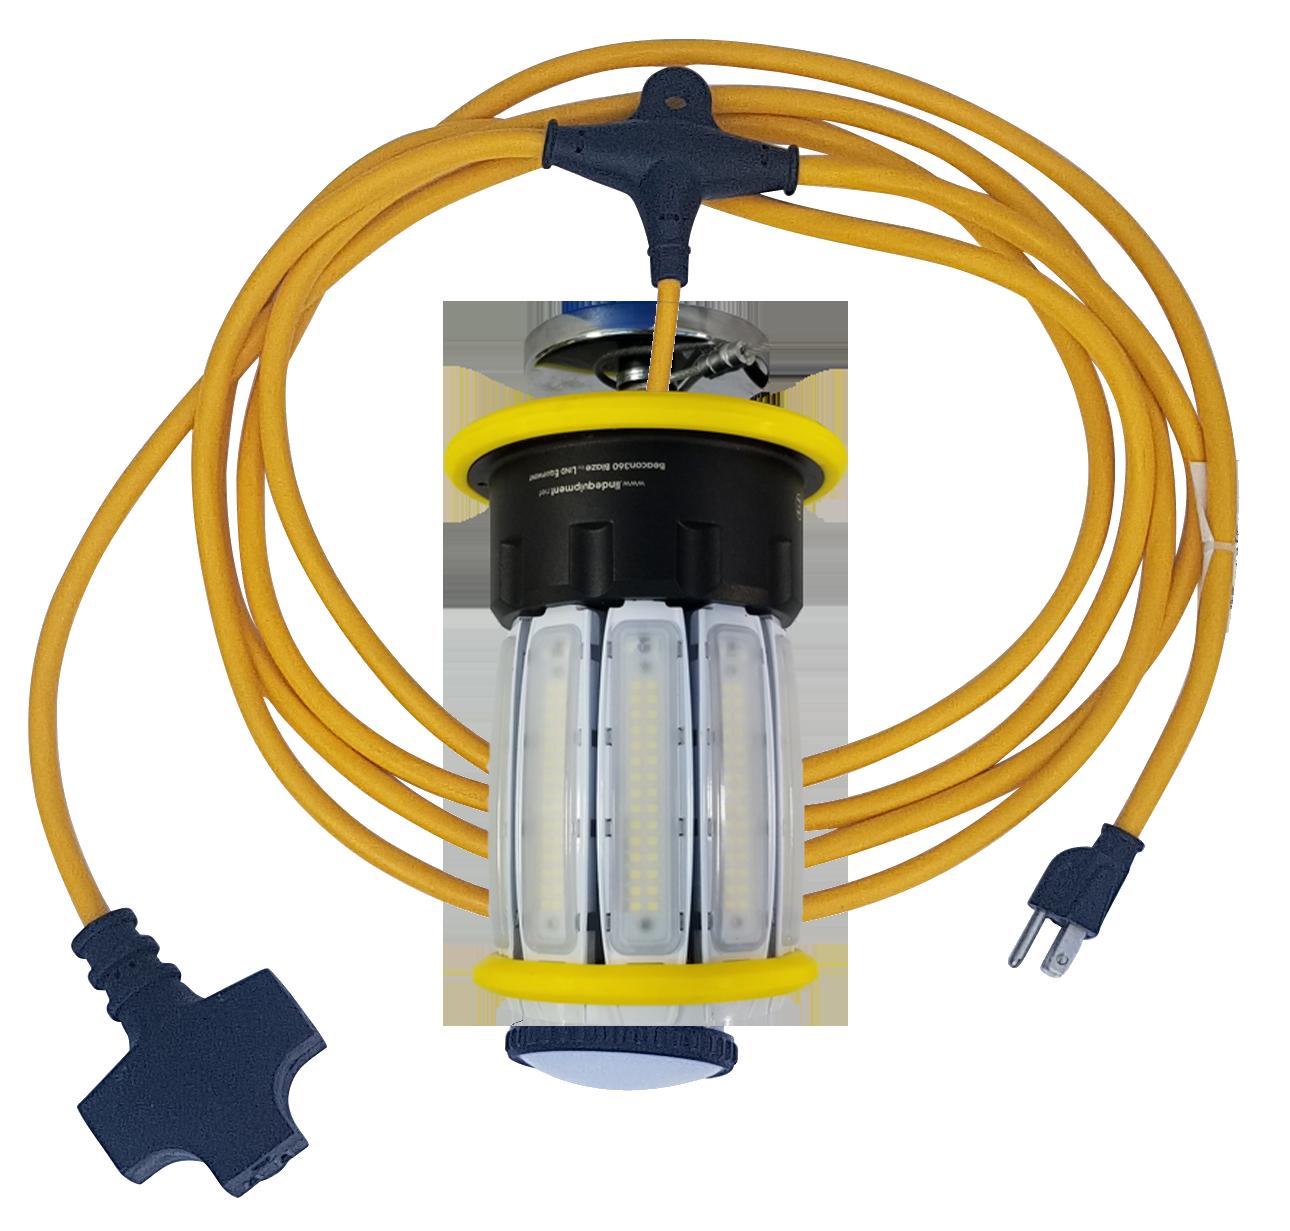 Beacon360 Blaze - Versatile jobsite light